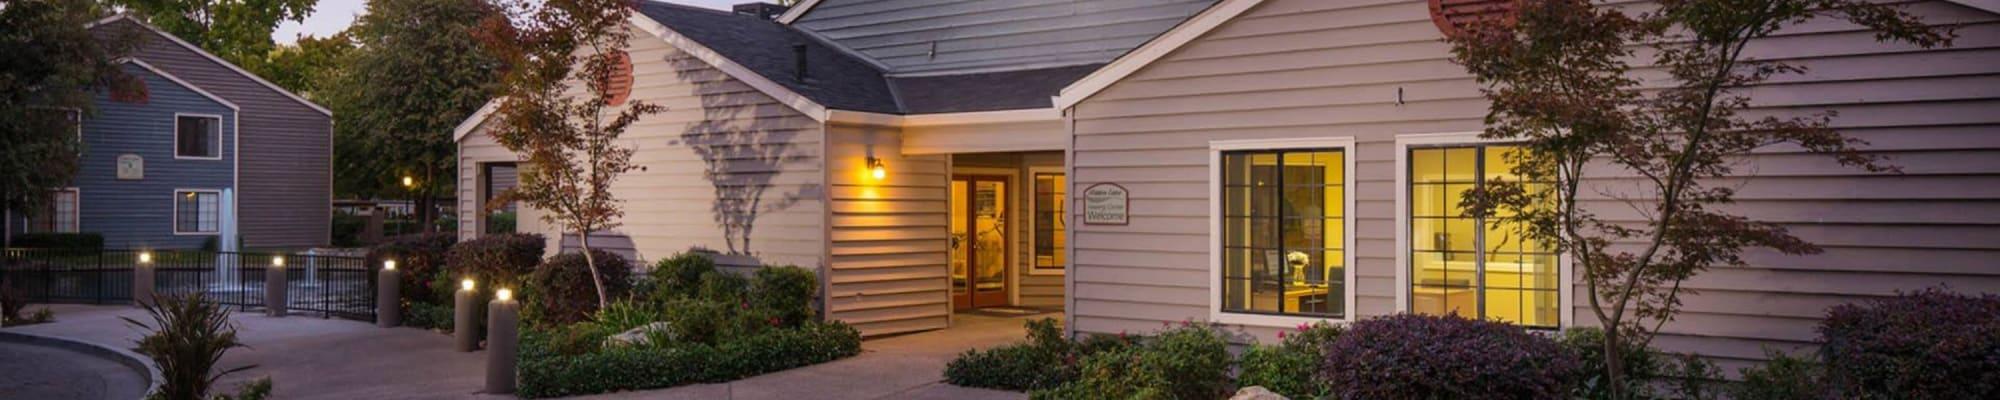 Apply to live at Hidden Lake Condominium Rentals in Sacramento, California